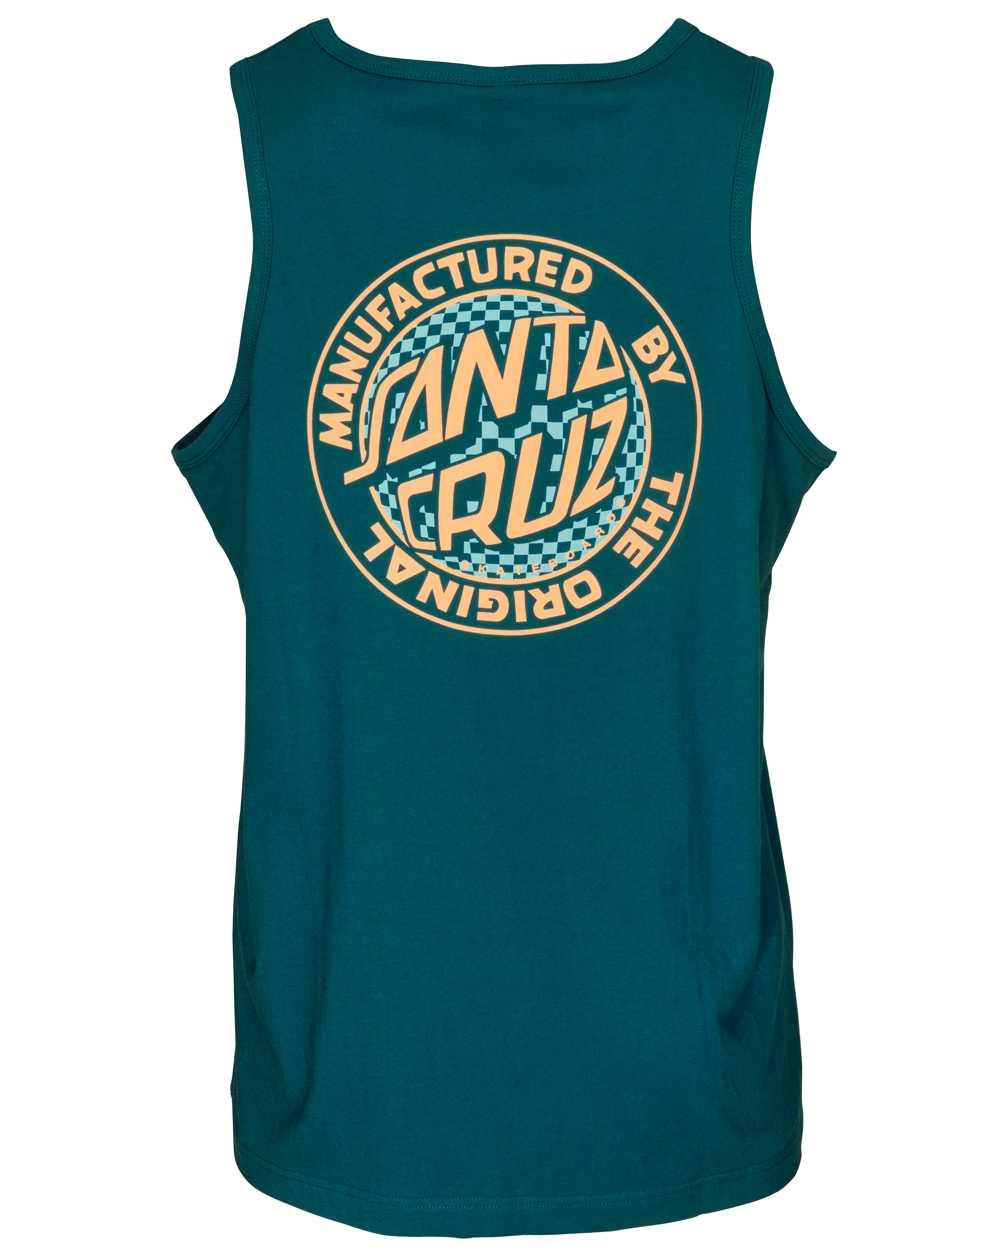 Santa Cruz Men's Vest Fisheye MFG Dot Ink Blue